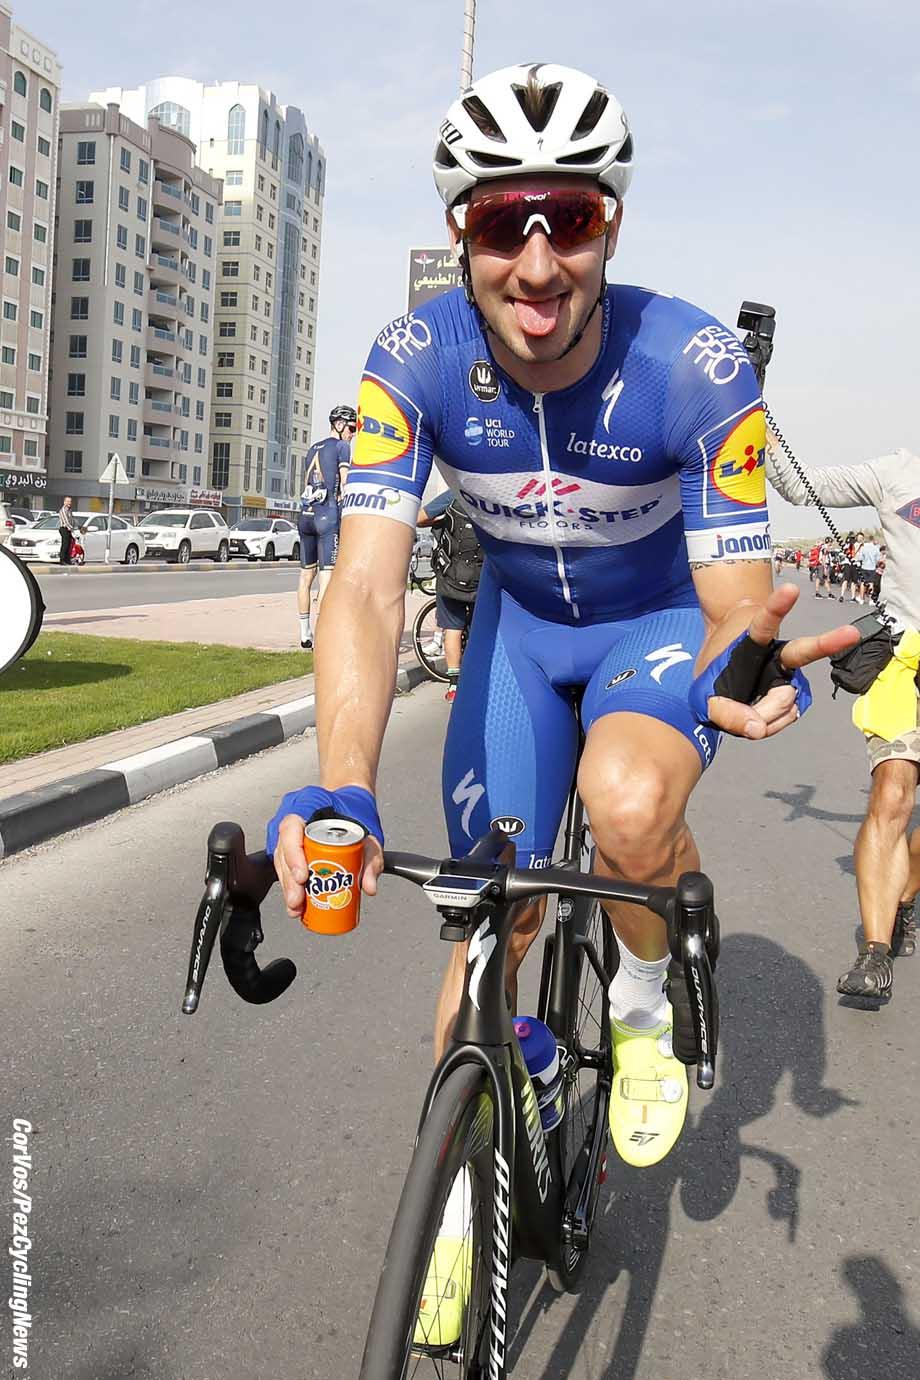 Ras al Khaimah - Dubai - wielrennen - cycling - cyclisme - radsport - Elia Viviani (ITA - QuickStep - Floors) pictured during the 2018 Dubai Tour stage 2 - from Skydive Dubai to Ras al Khaimah (190KM) - photo LB/RB/Cor Vos © 2018